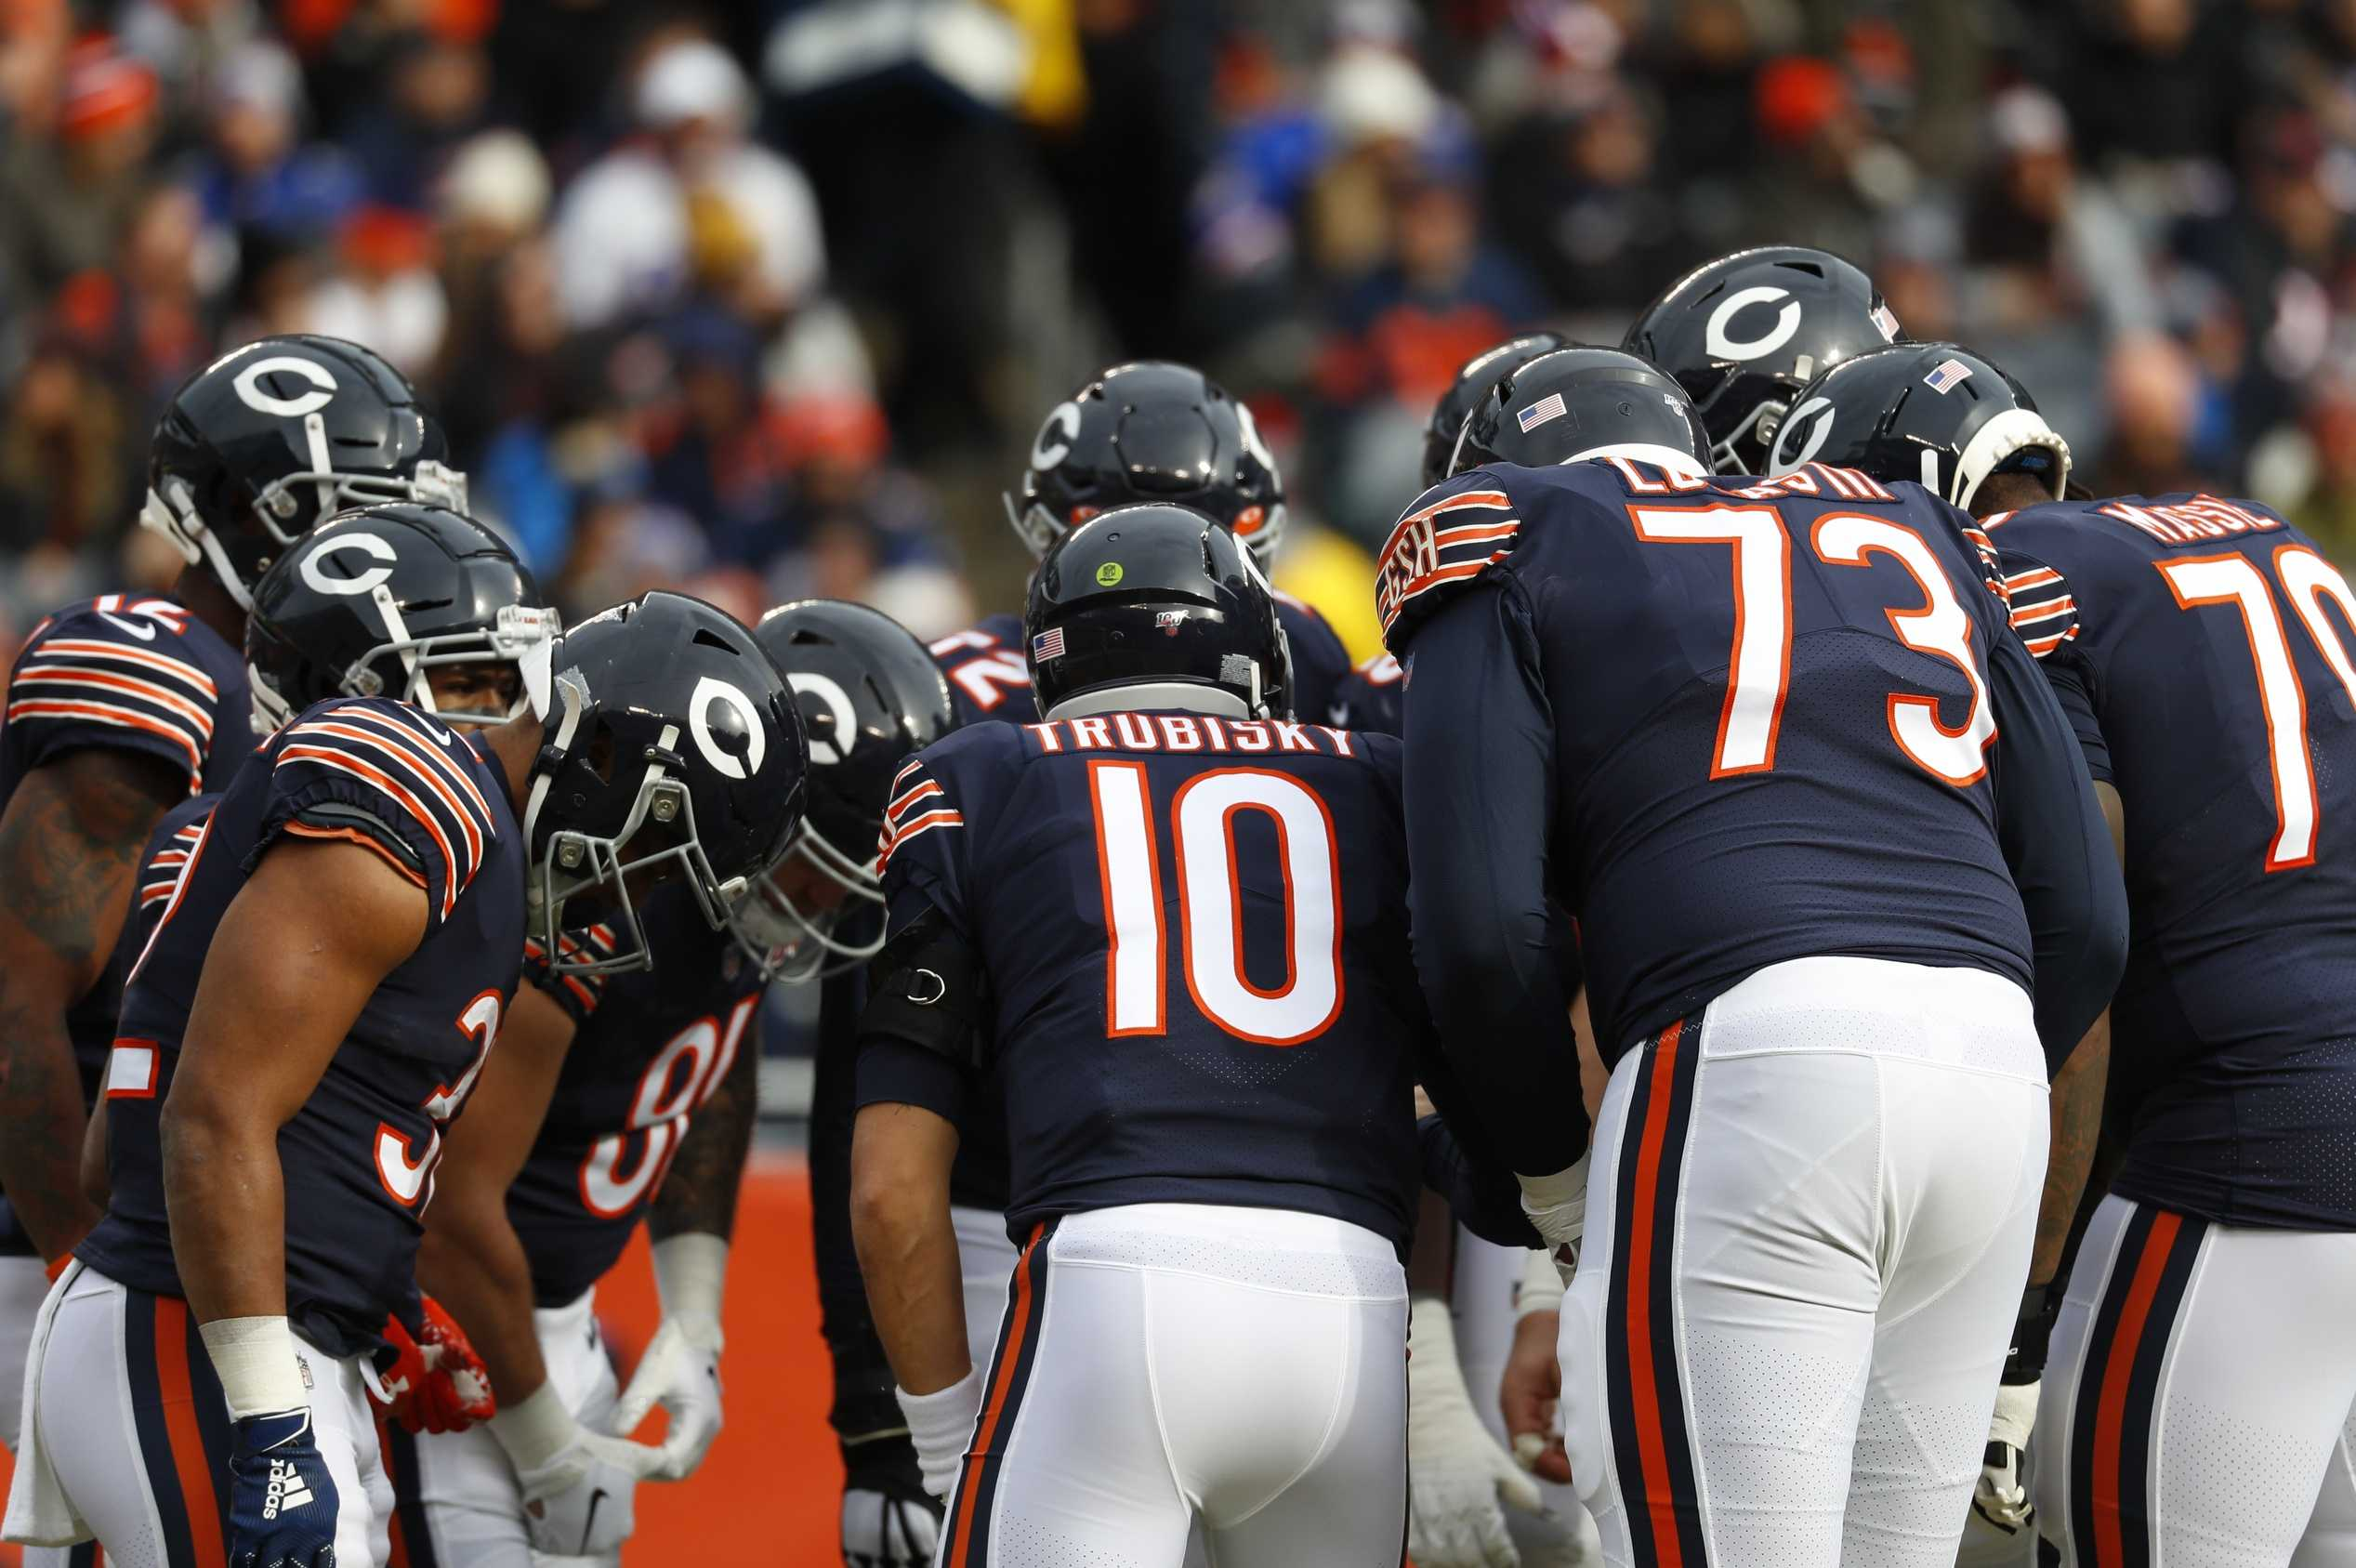 NFC North - Chicago Bears